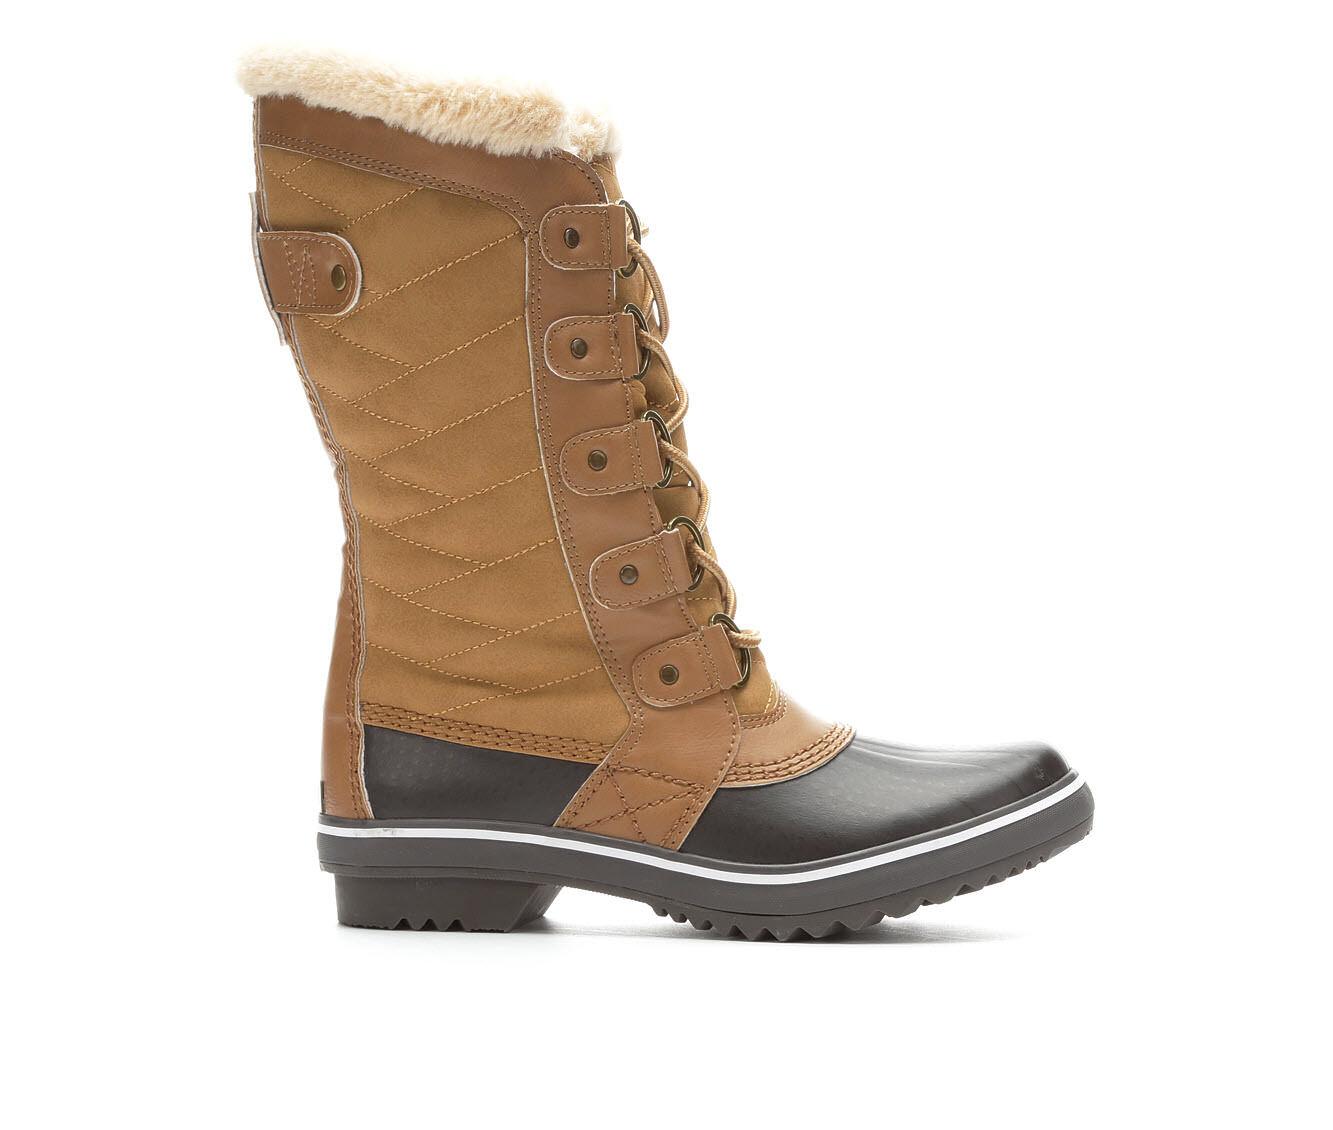 clearance great deals Women's JBU by Jambu Lorna Winter Boots footlocker f57YCRgV